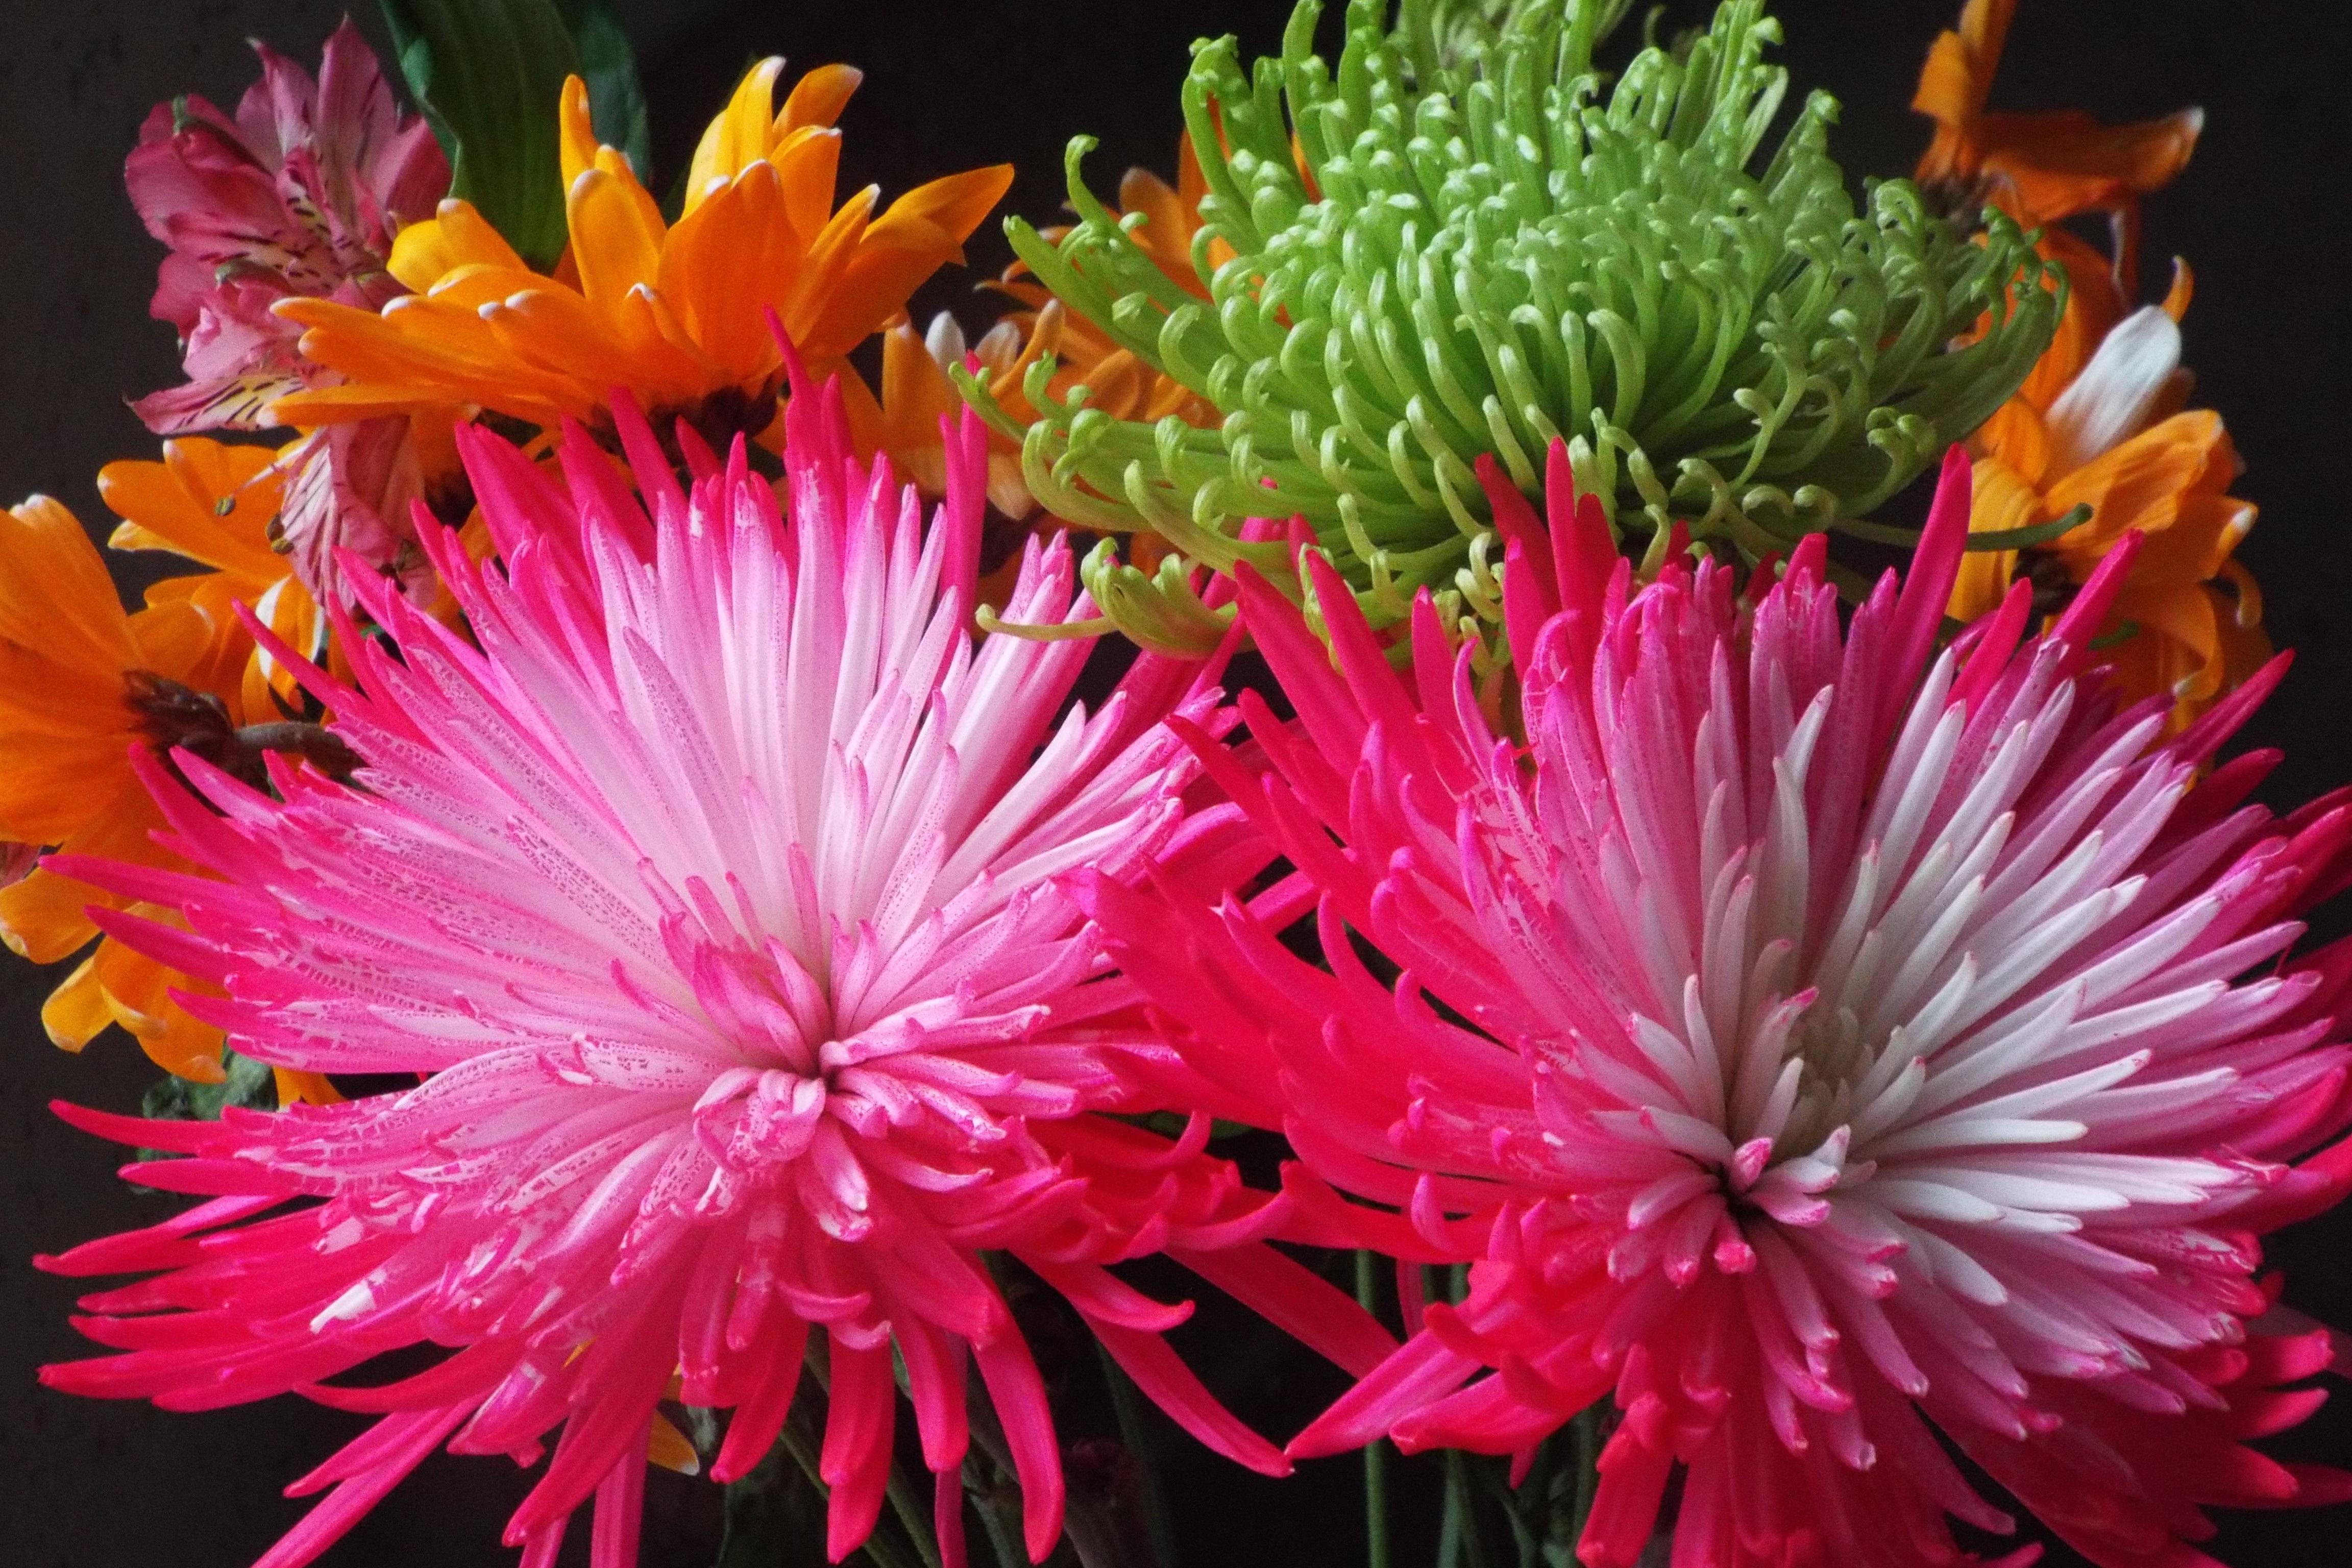 Free Images : petal, green, yellow, pink, flora, flowers, gerbera ...